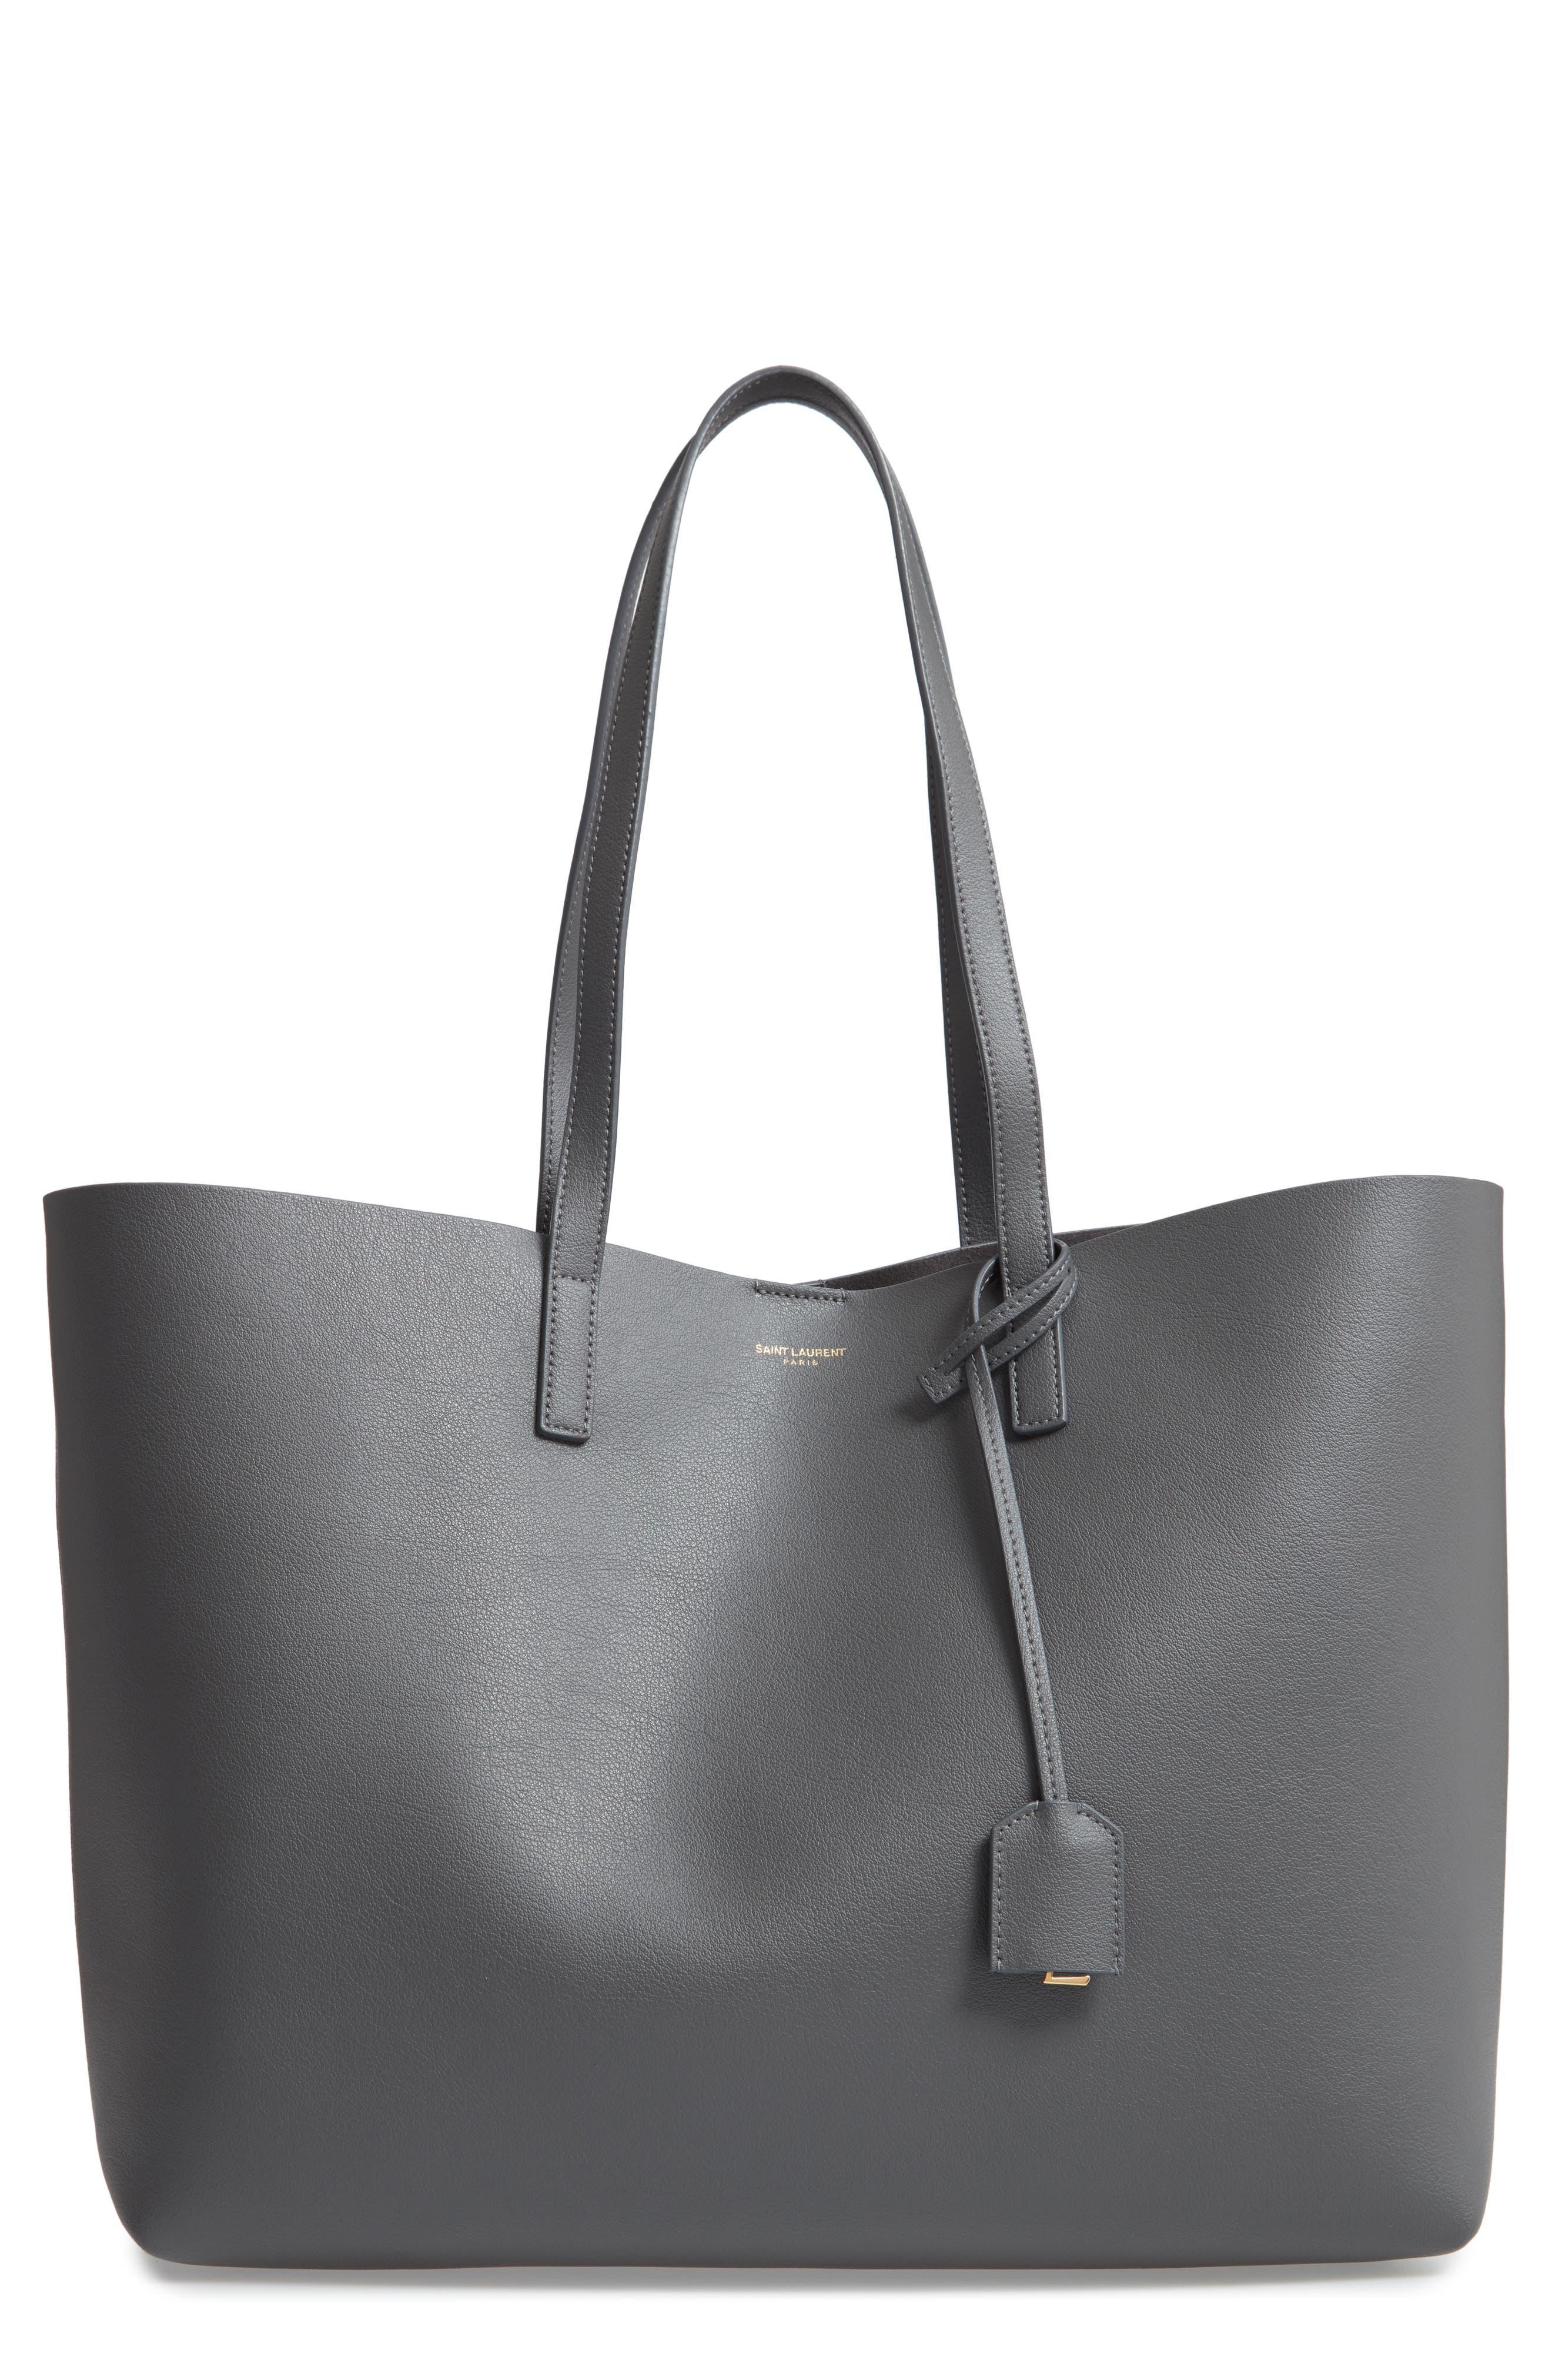 51144e621a59a Women's Saint Laurent Handbags | Nordstrom